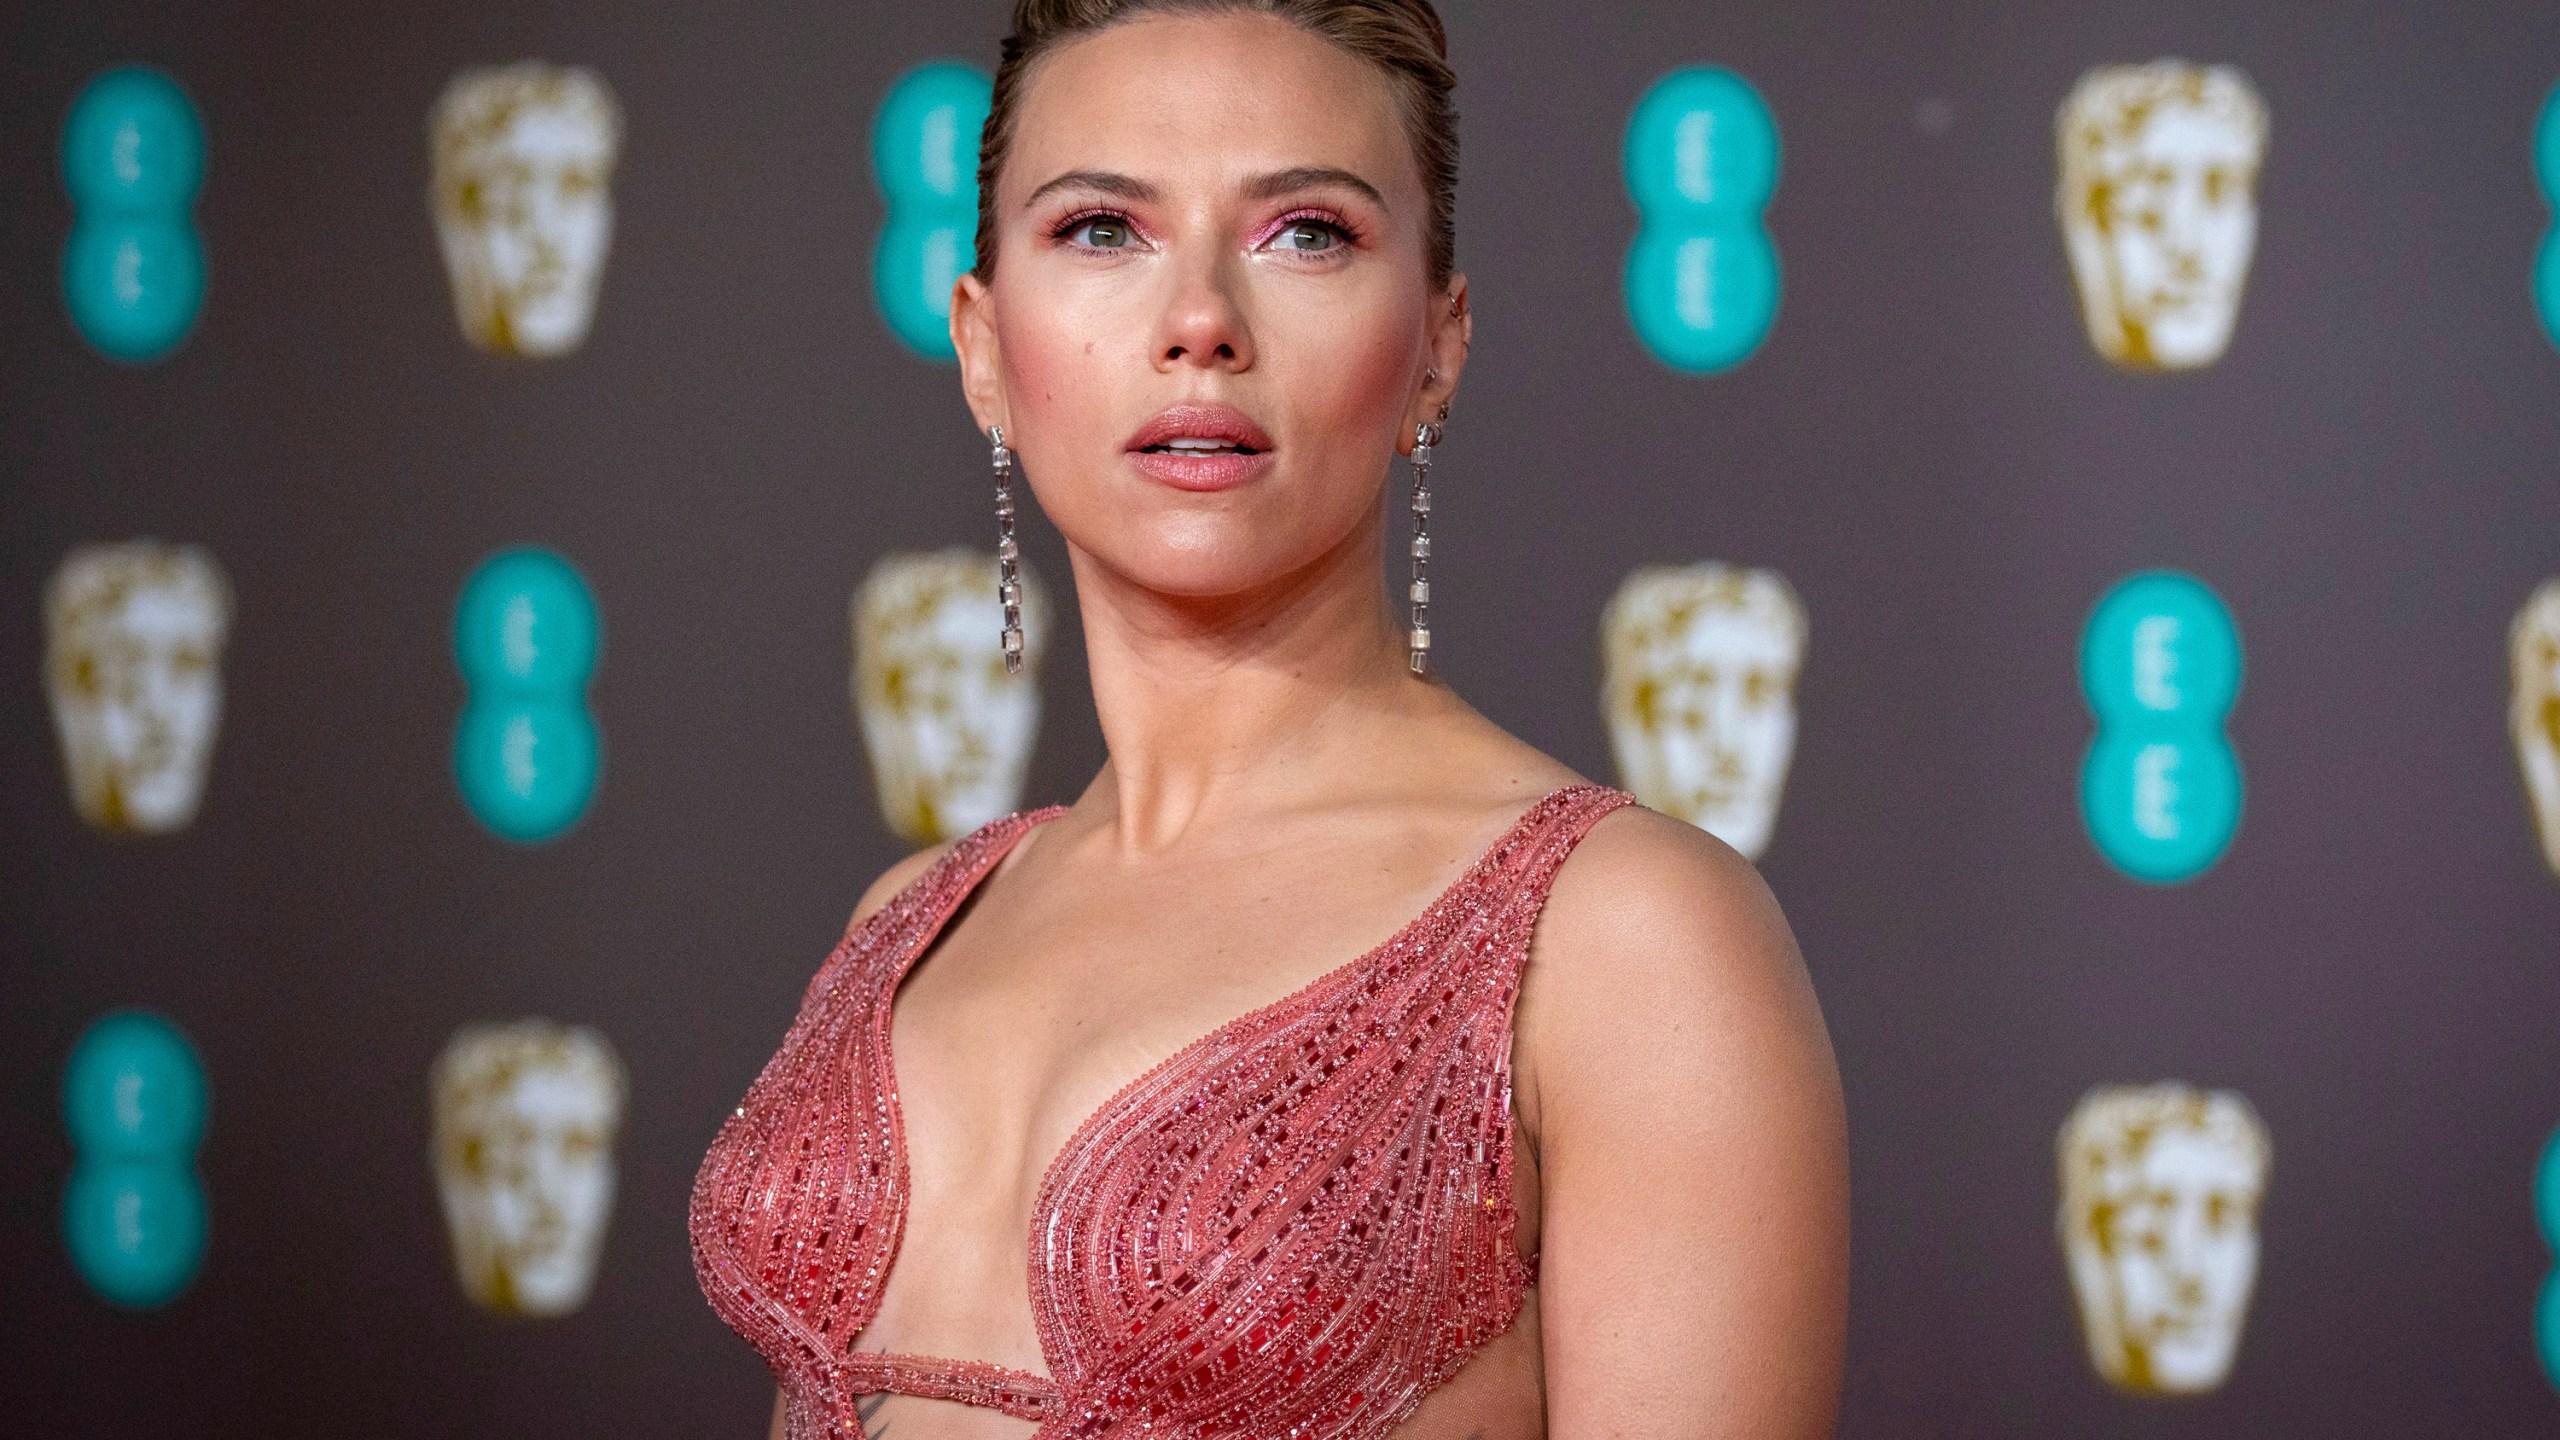 Scarlett Johansson arrives at the Bafta Film Awards, in central London on Feb. 2 2020. (Vianney Le Caer/Invision/Associated Press, File)